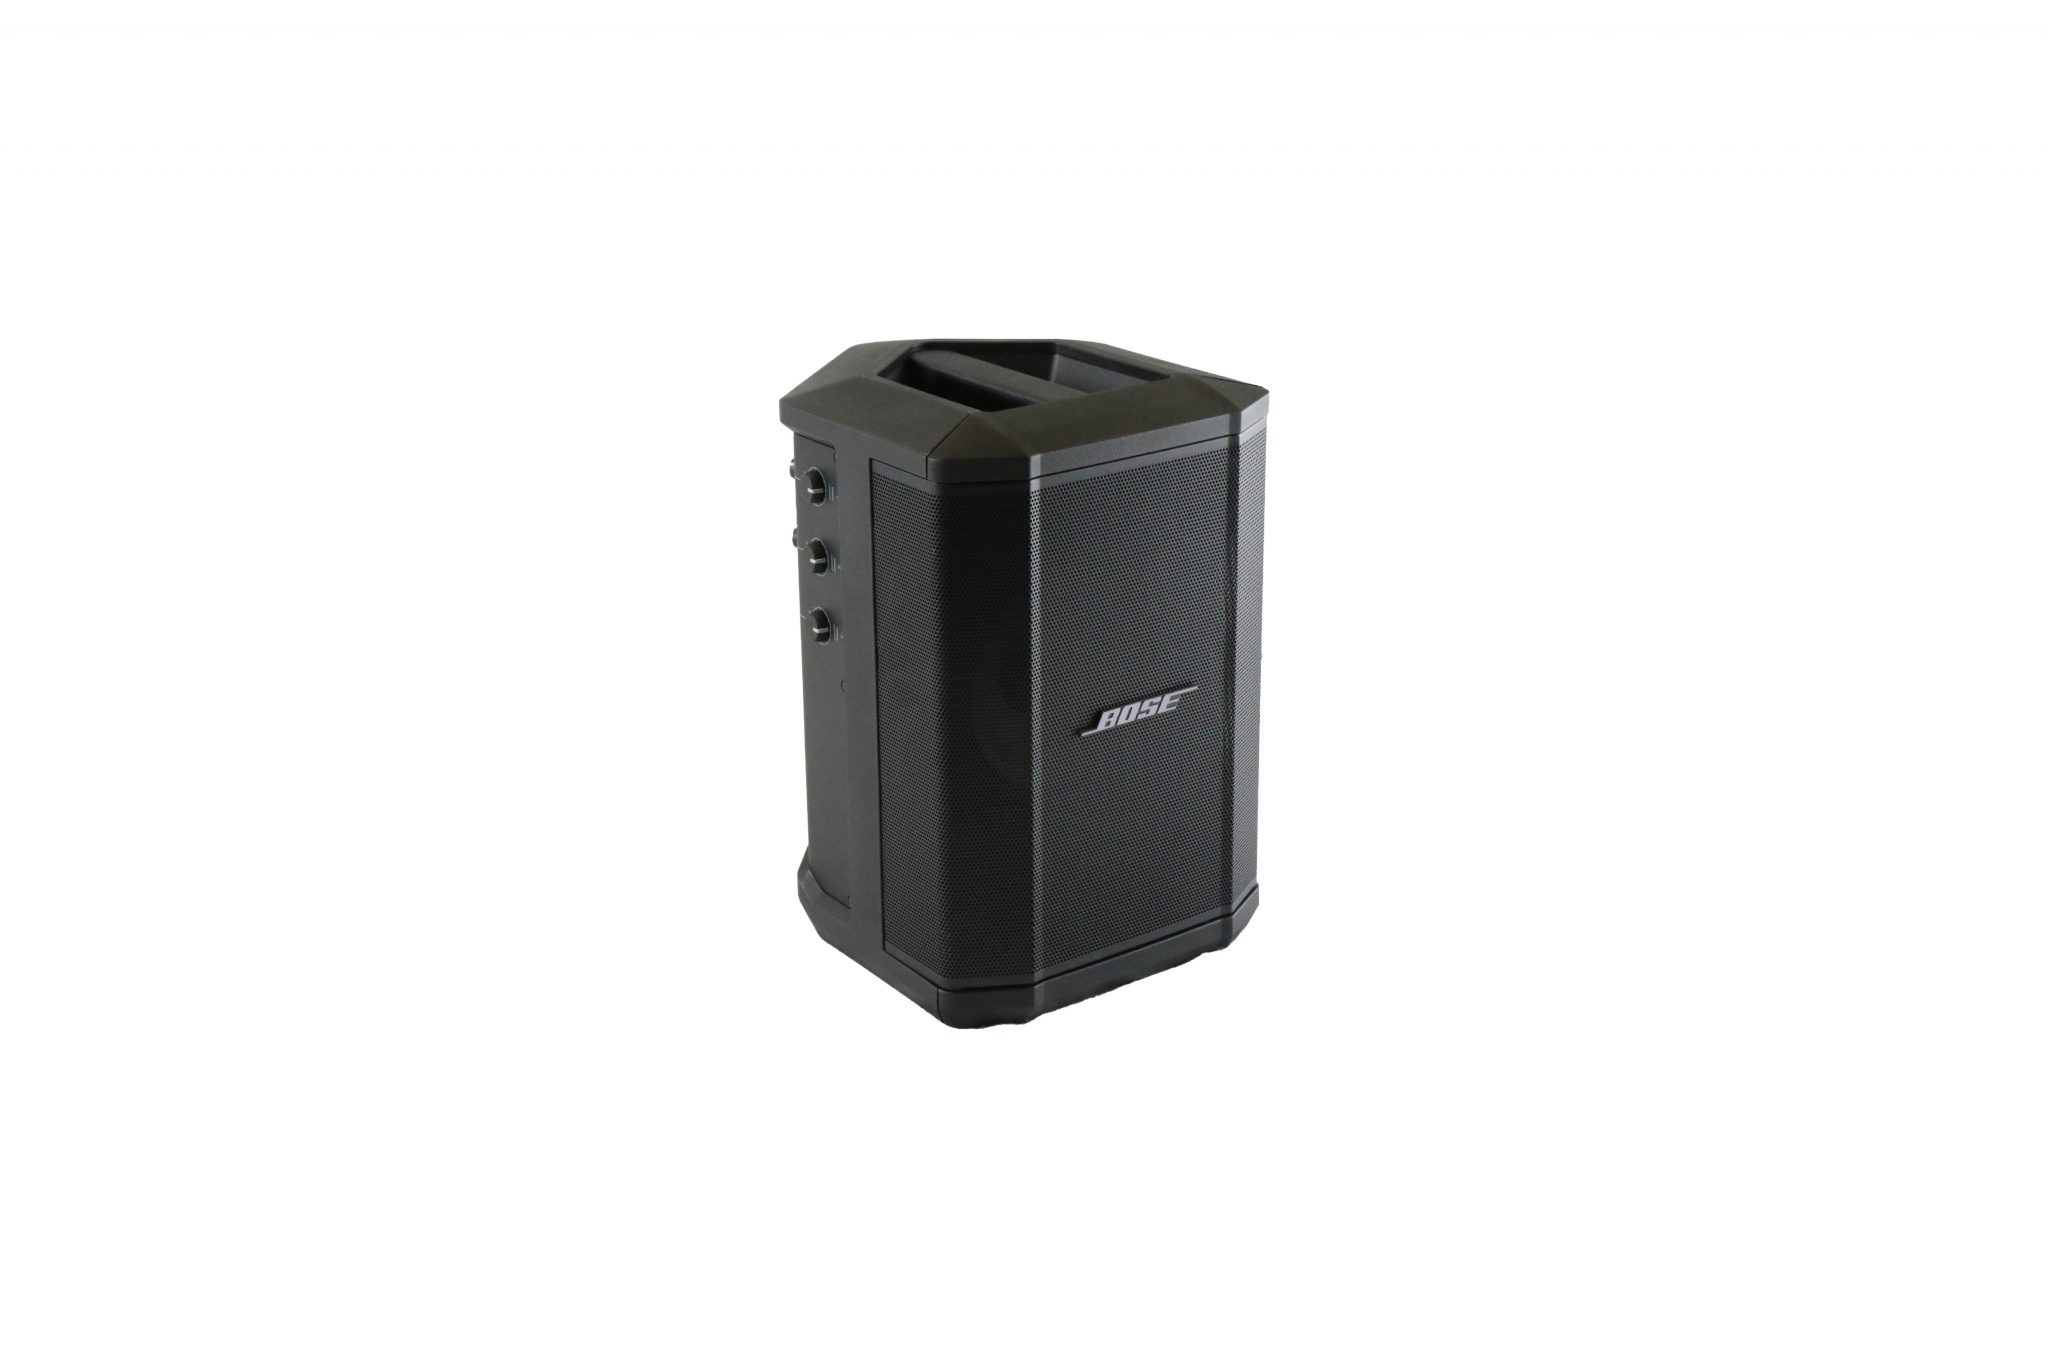 Bose S1 Pro Akkulautsprecher